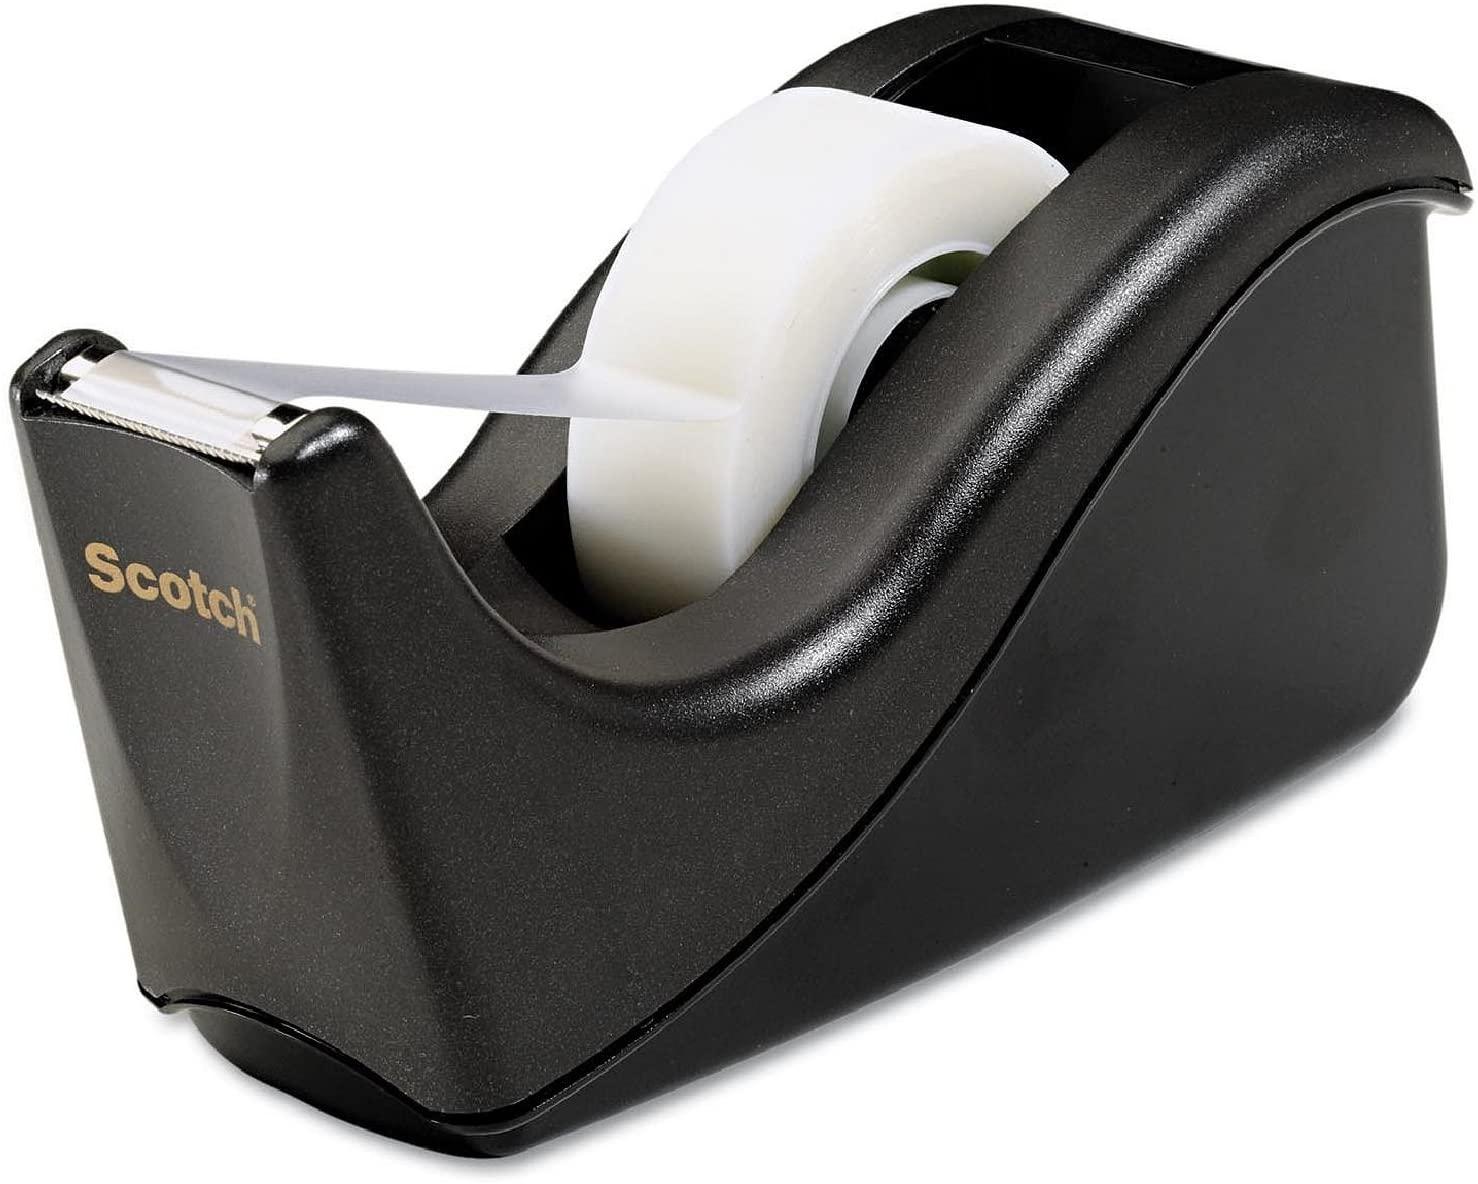 Scotch Value Desktop Tape Dispenser, 1 Inch Core, Two Tone Black (C60-BK) (Pack of 3)